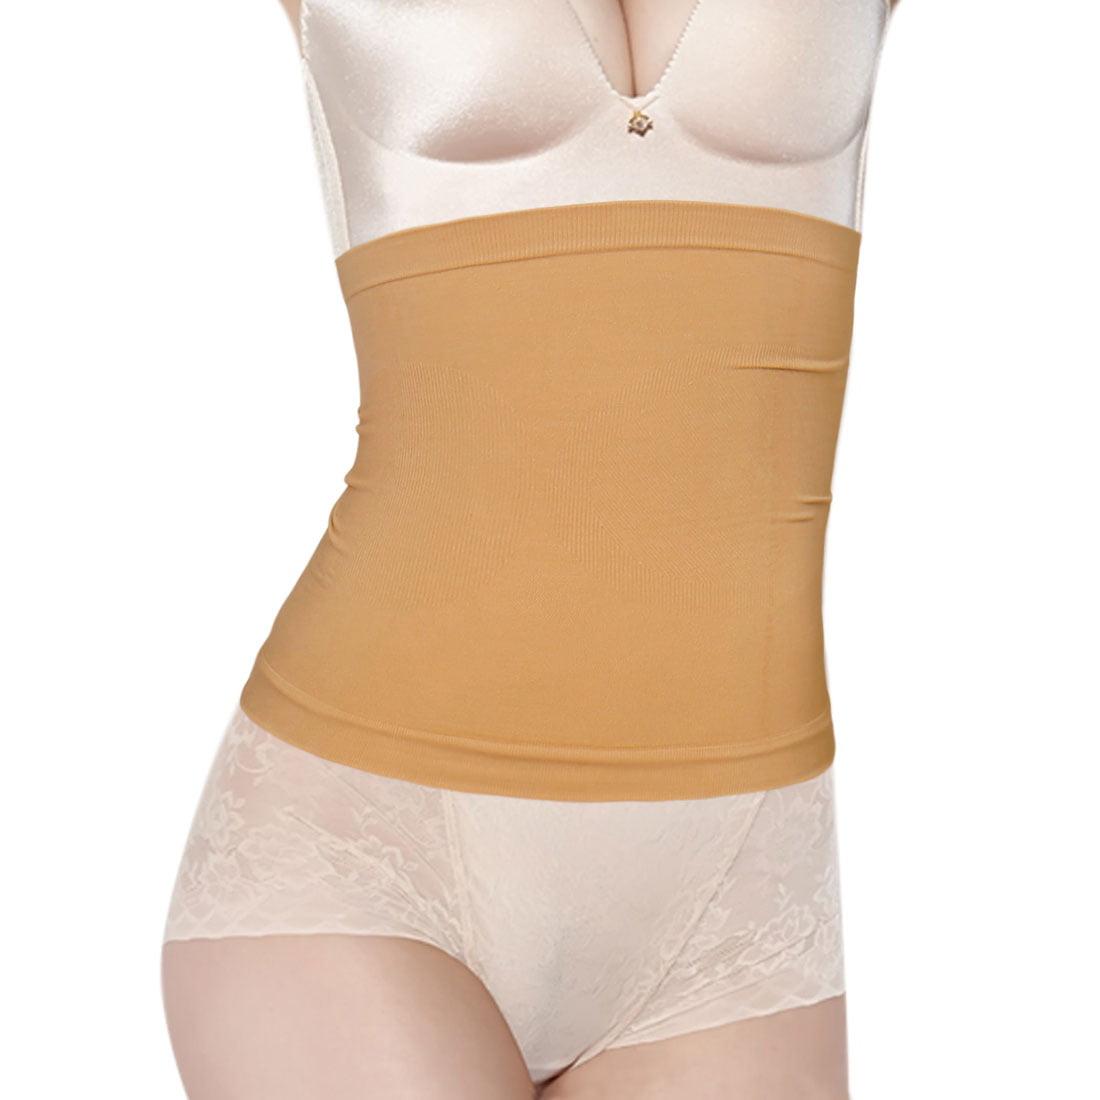 9052764c74 Women s Circle Pattern Stretchy Seamless Waist Cincher Beige (Size ...